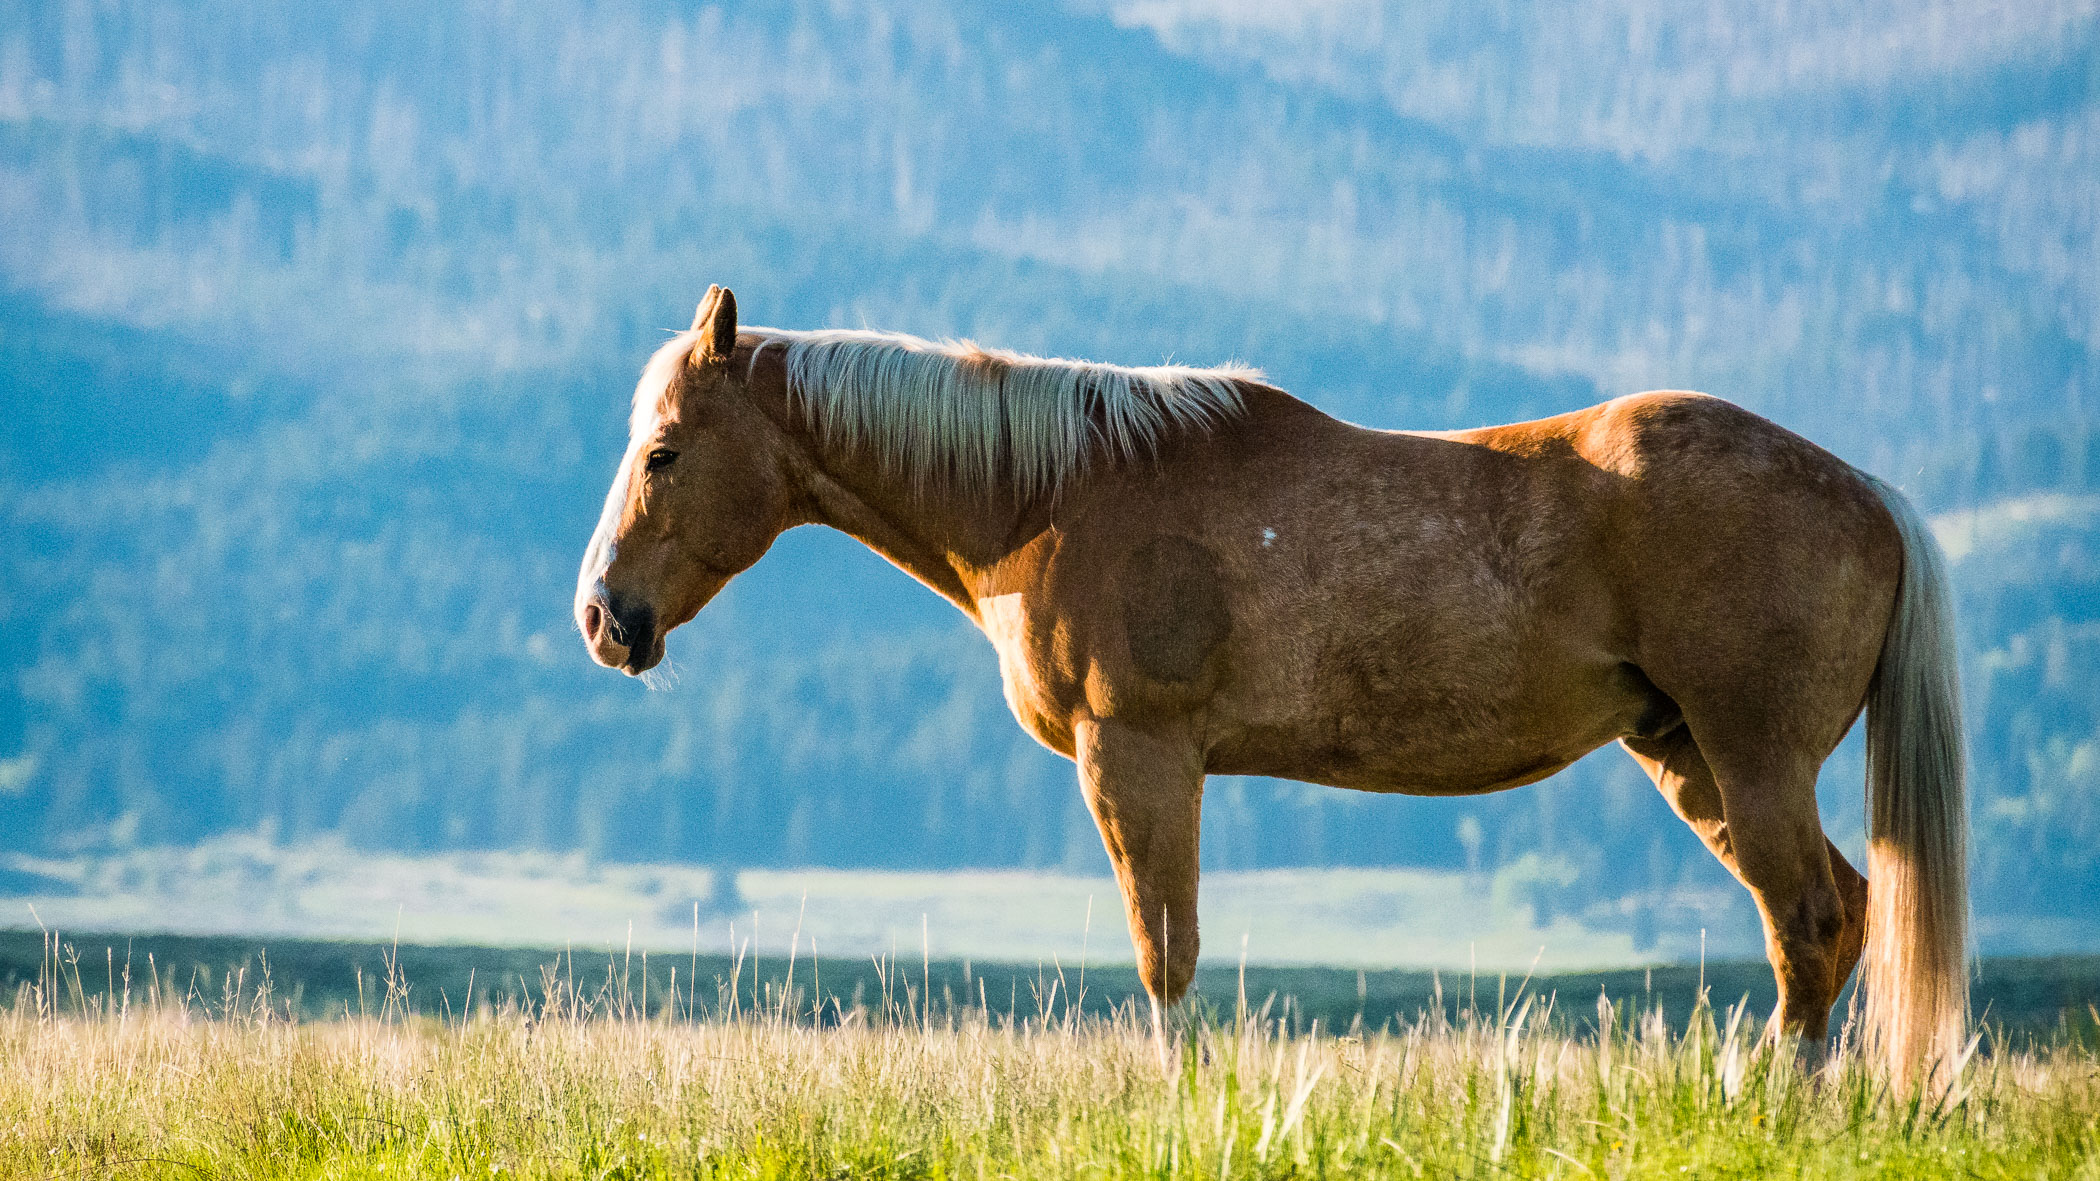 horse-centennial-valley-montana-usa-landscape-photographer-jesper-anhede-01077-sony-rx10